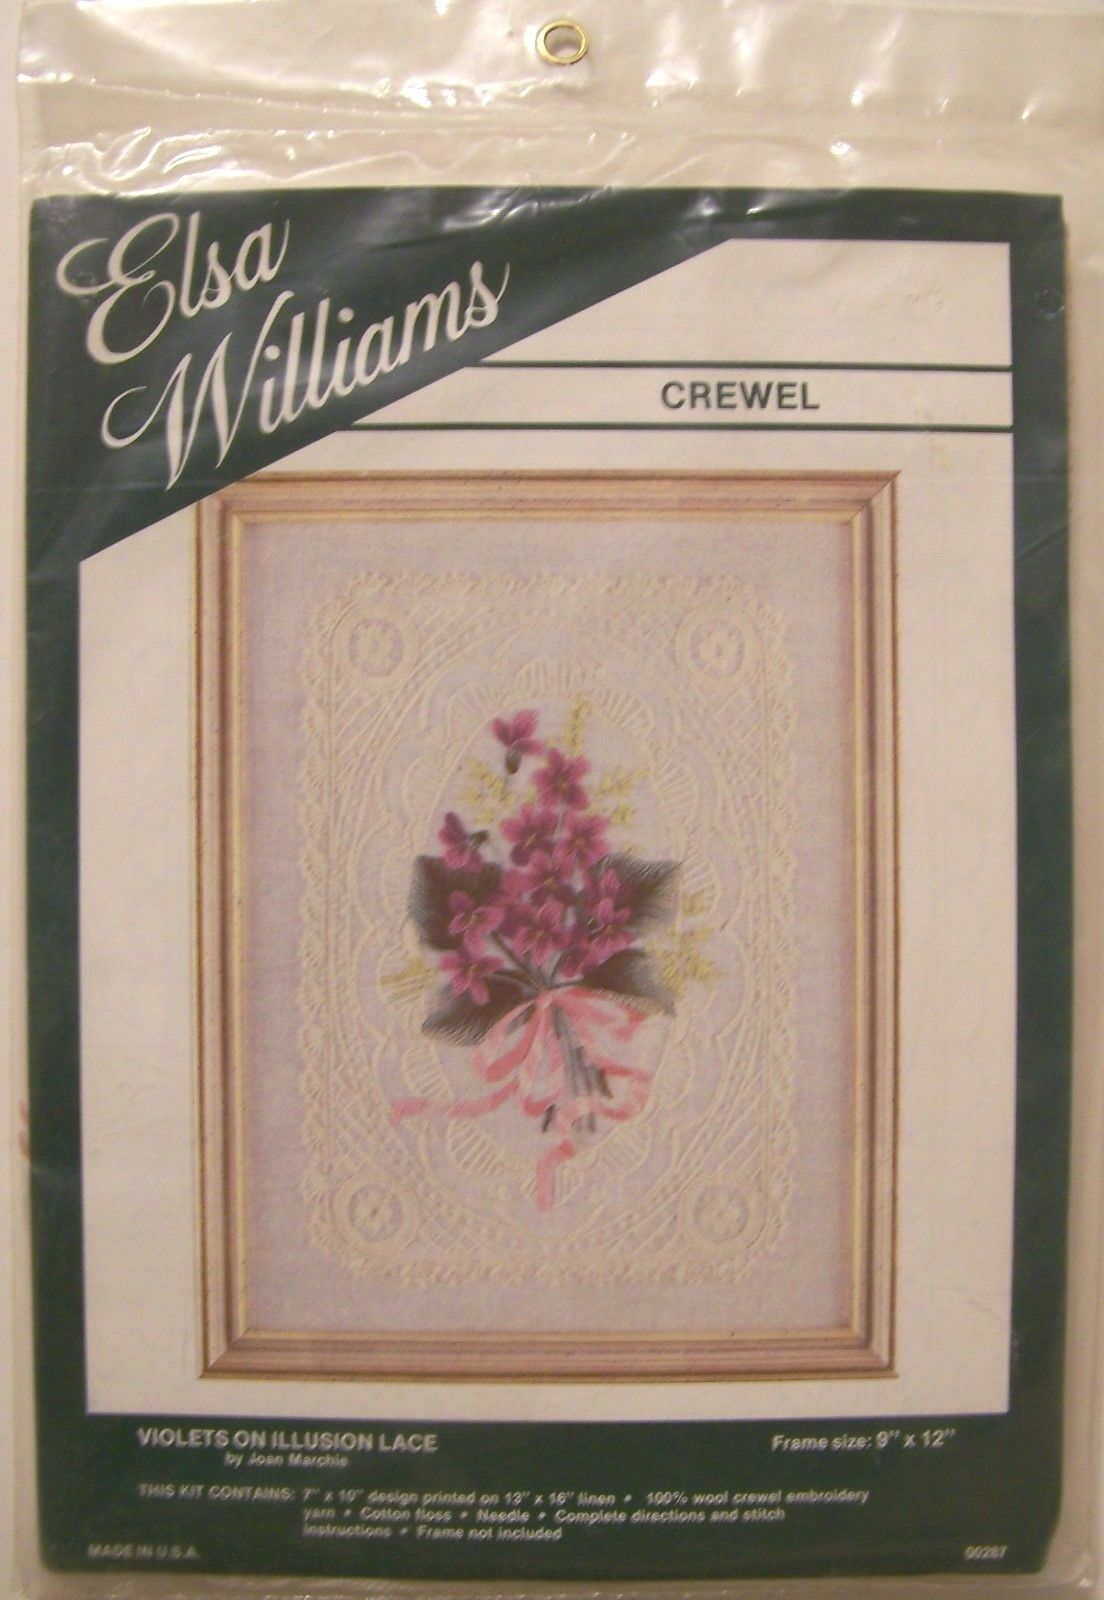 Elsa Williams Crewel Violets On Illusion Lace 00287 Embroidery Kit